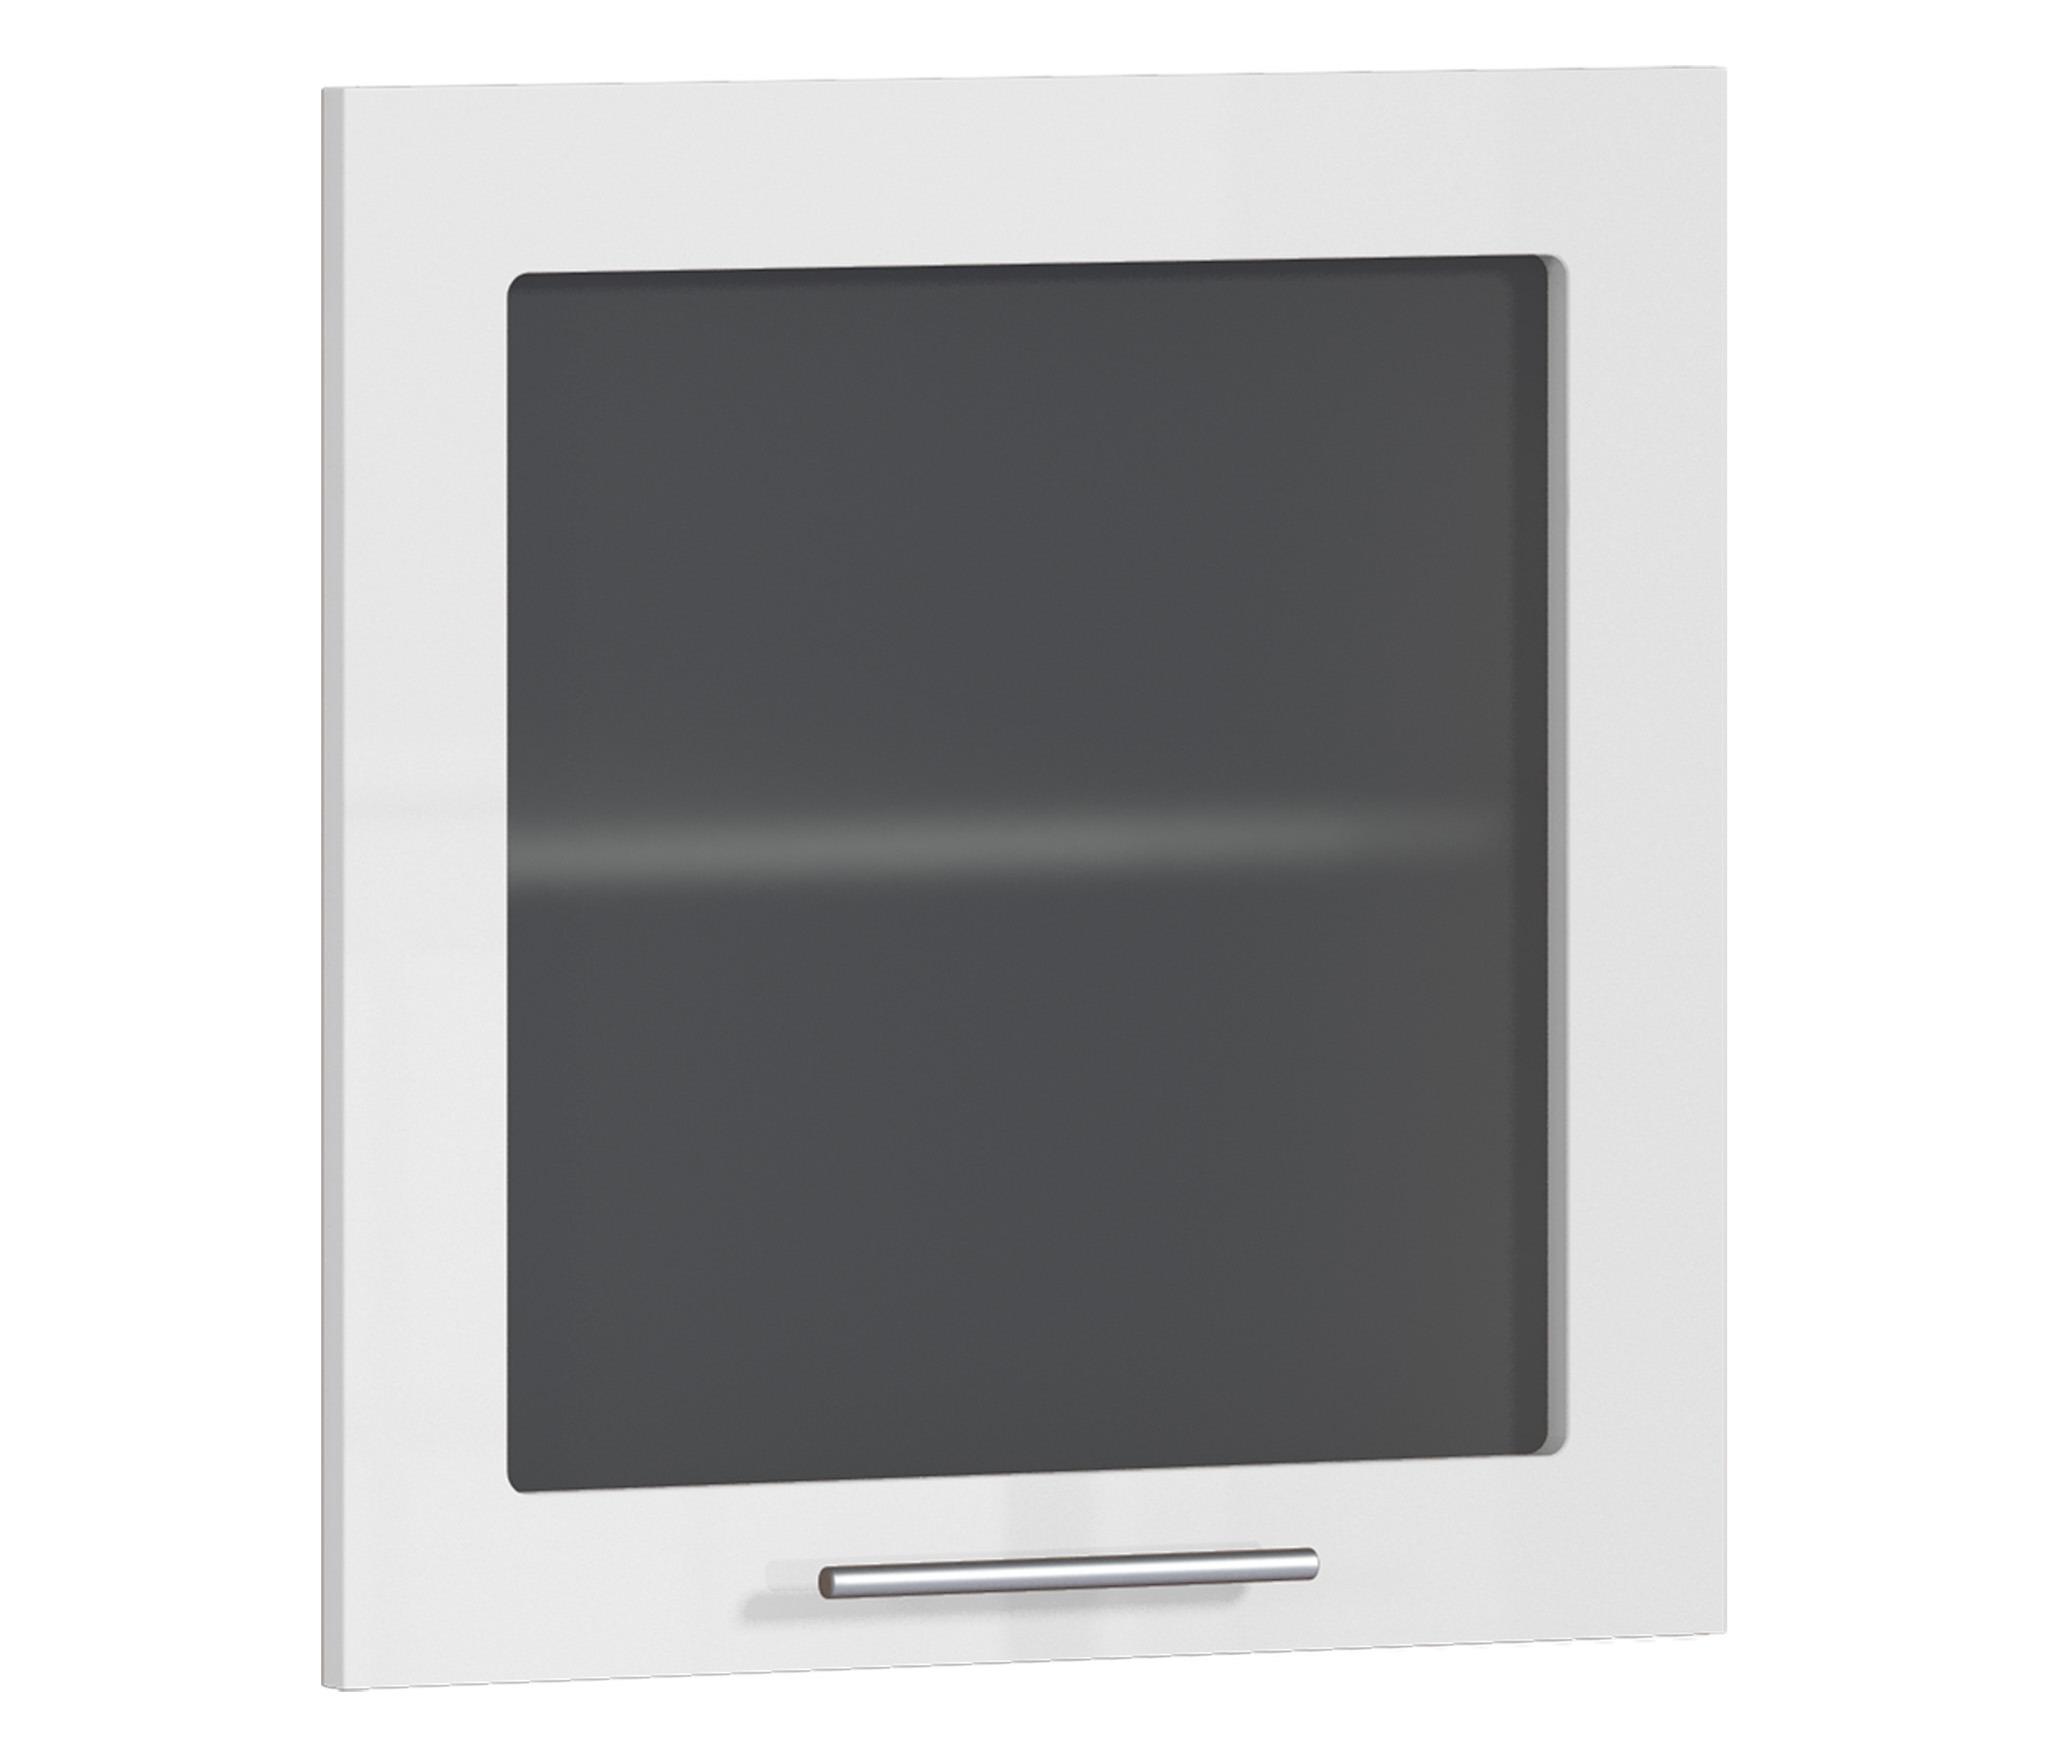 Анна ФВ-360С витринаМебель для кухни<br><br><br>Длина мм: 596<br>Высота мм: 596<br>Глубина мм: 21